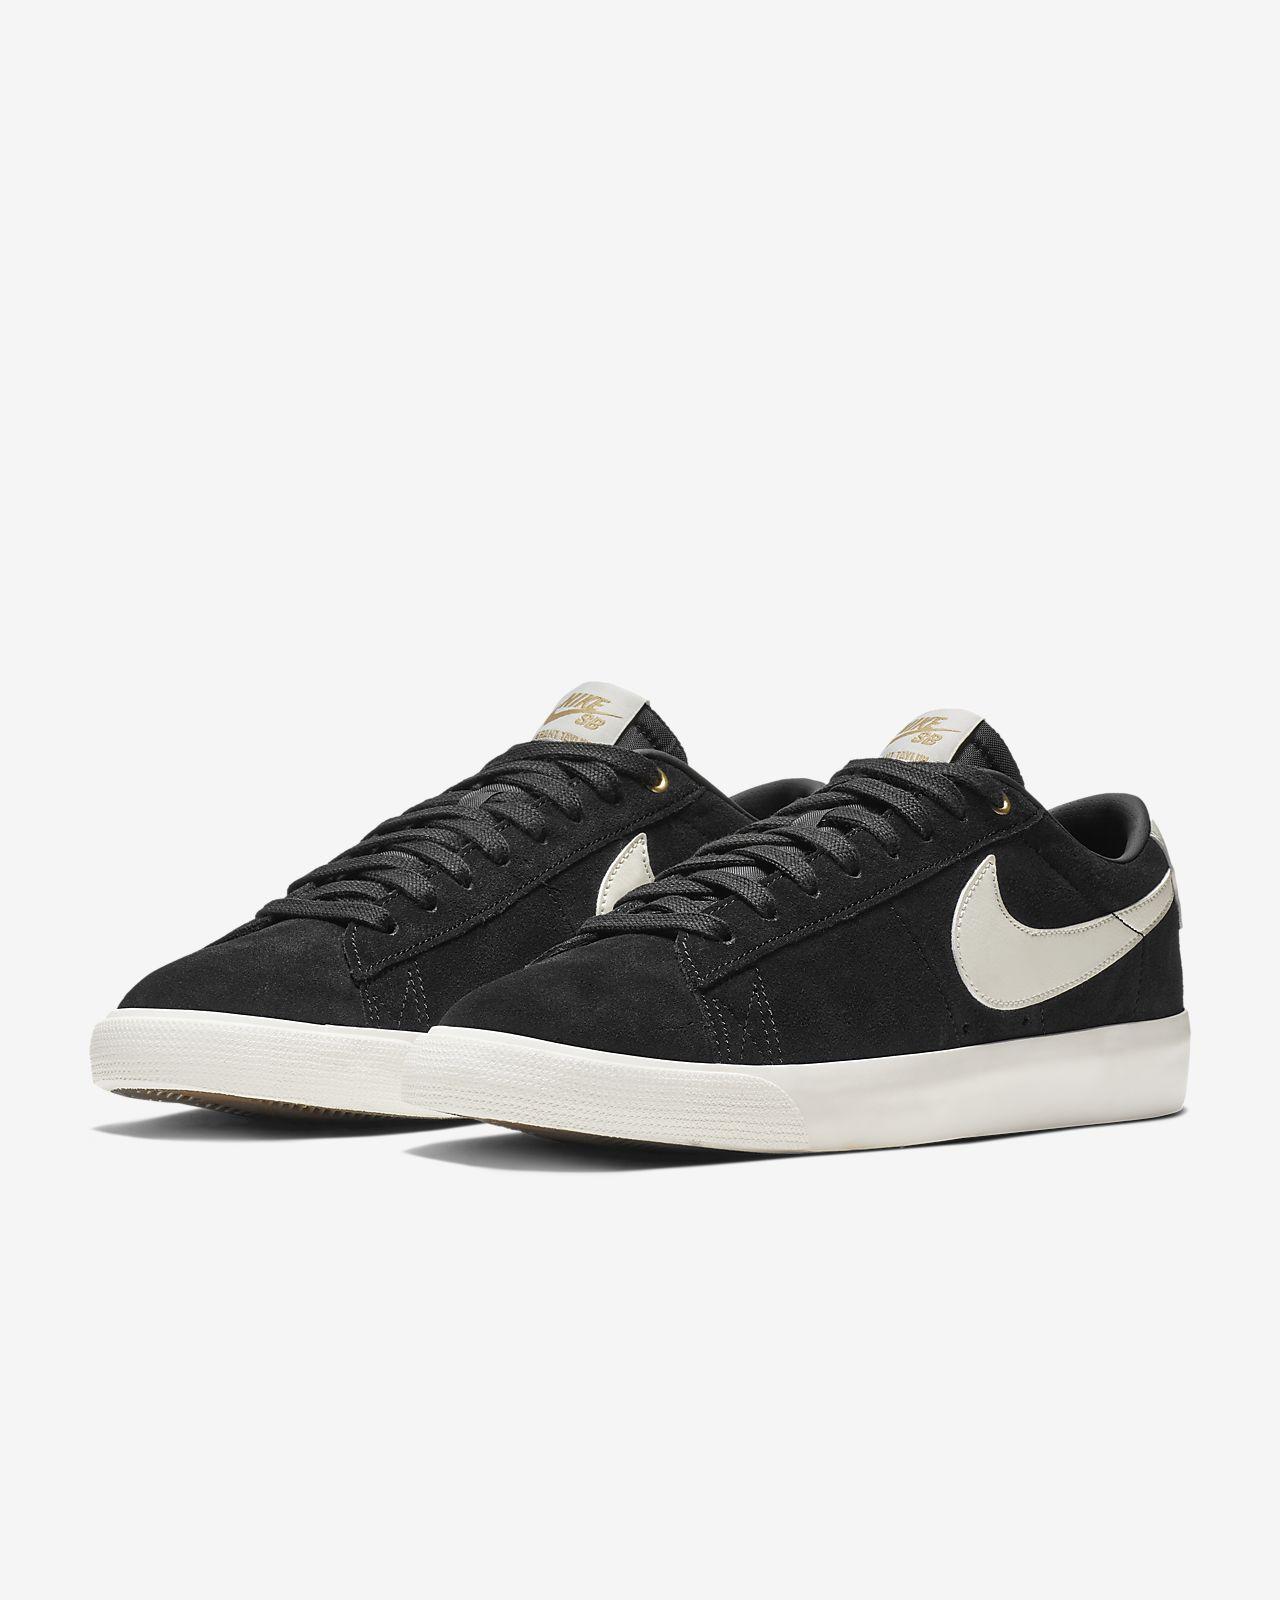 buy online 109e6 4a7ca ... Skateboardsko Nike SB Blazer Low GT